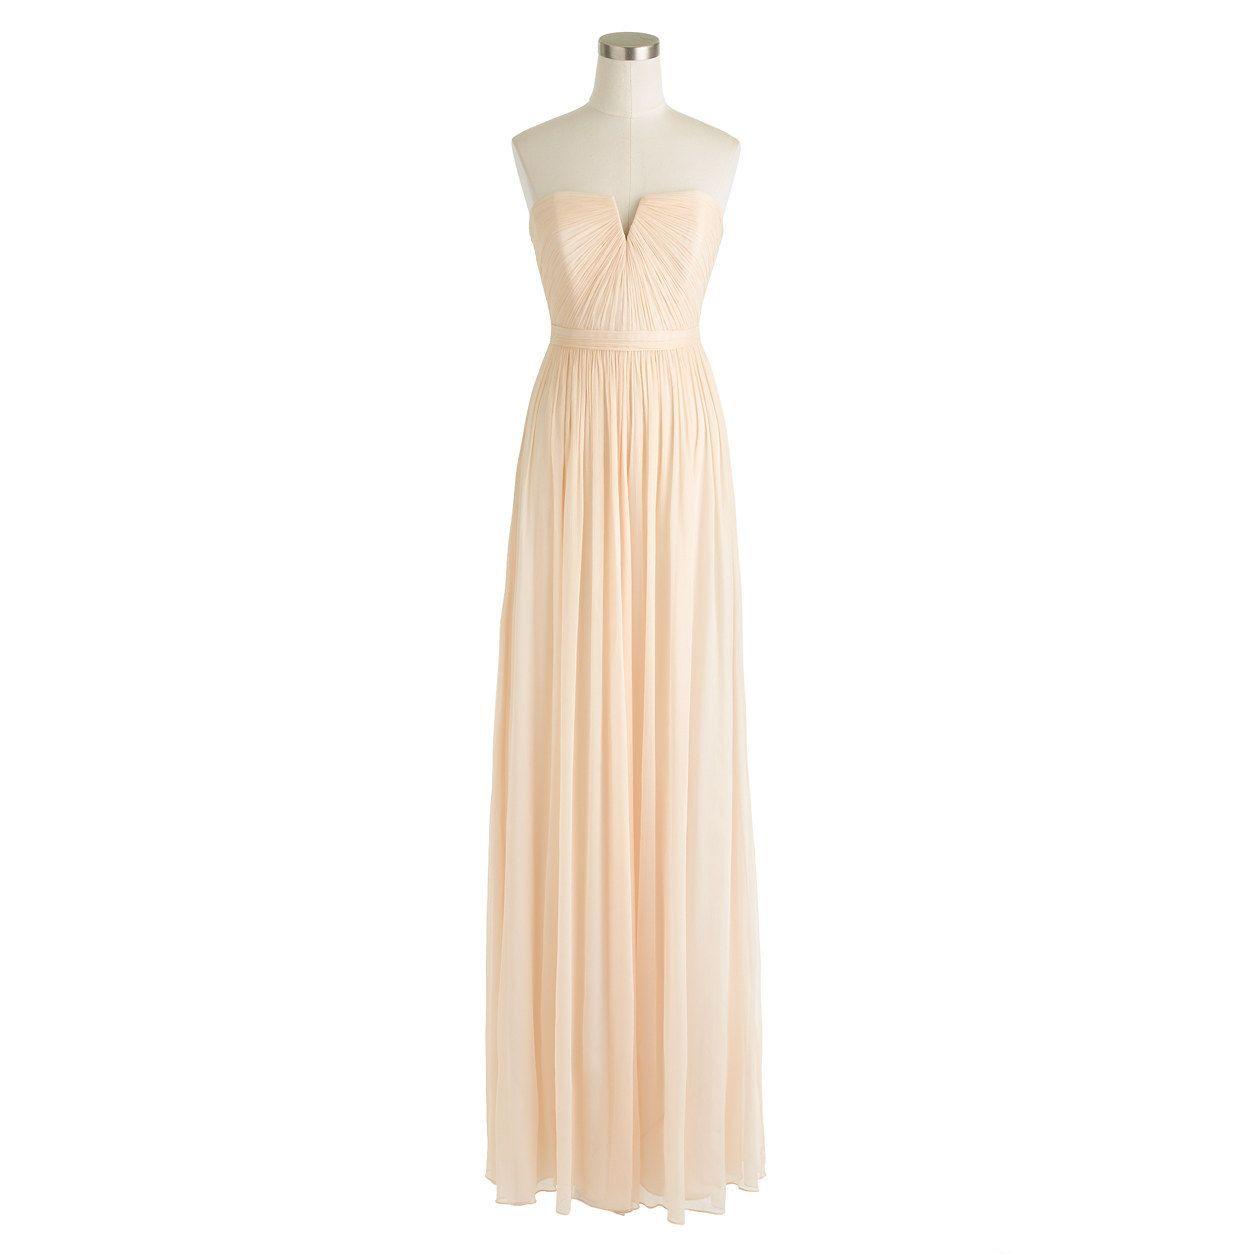 Kp wedding nadia long dress in silk chiffon silk chiffon j